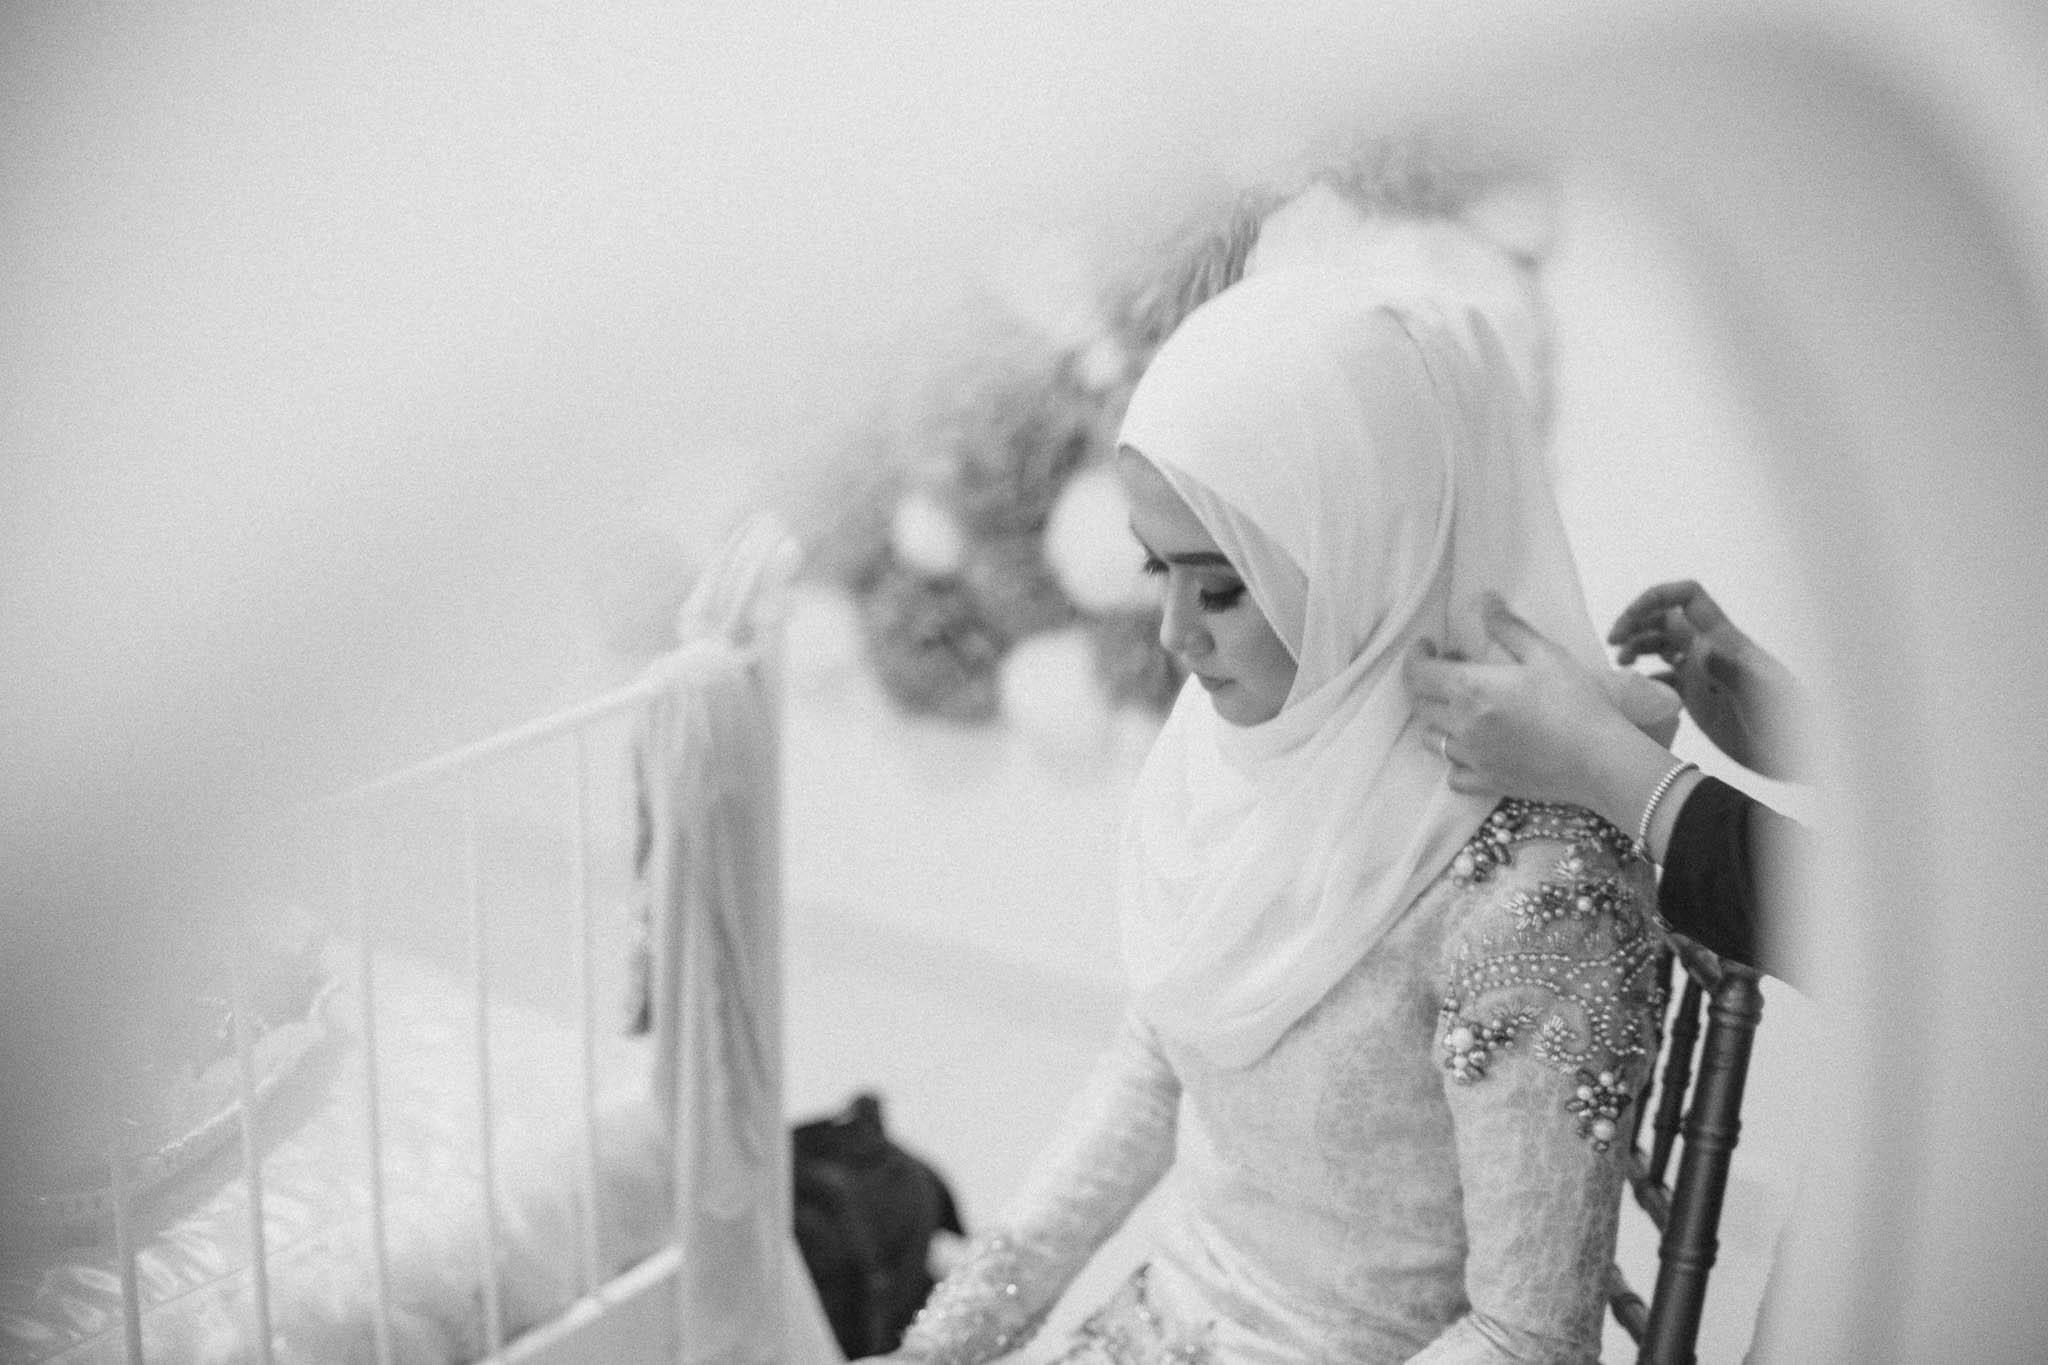 singapore-wedding-photographer-sharalyn-syazwan-026.jpg